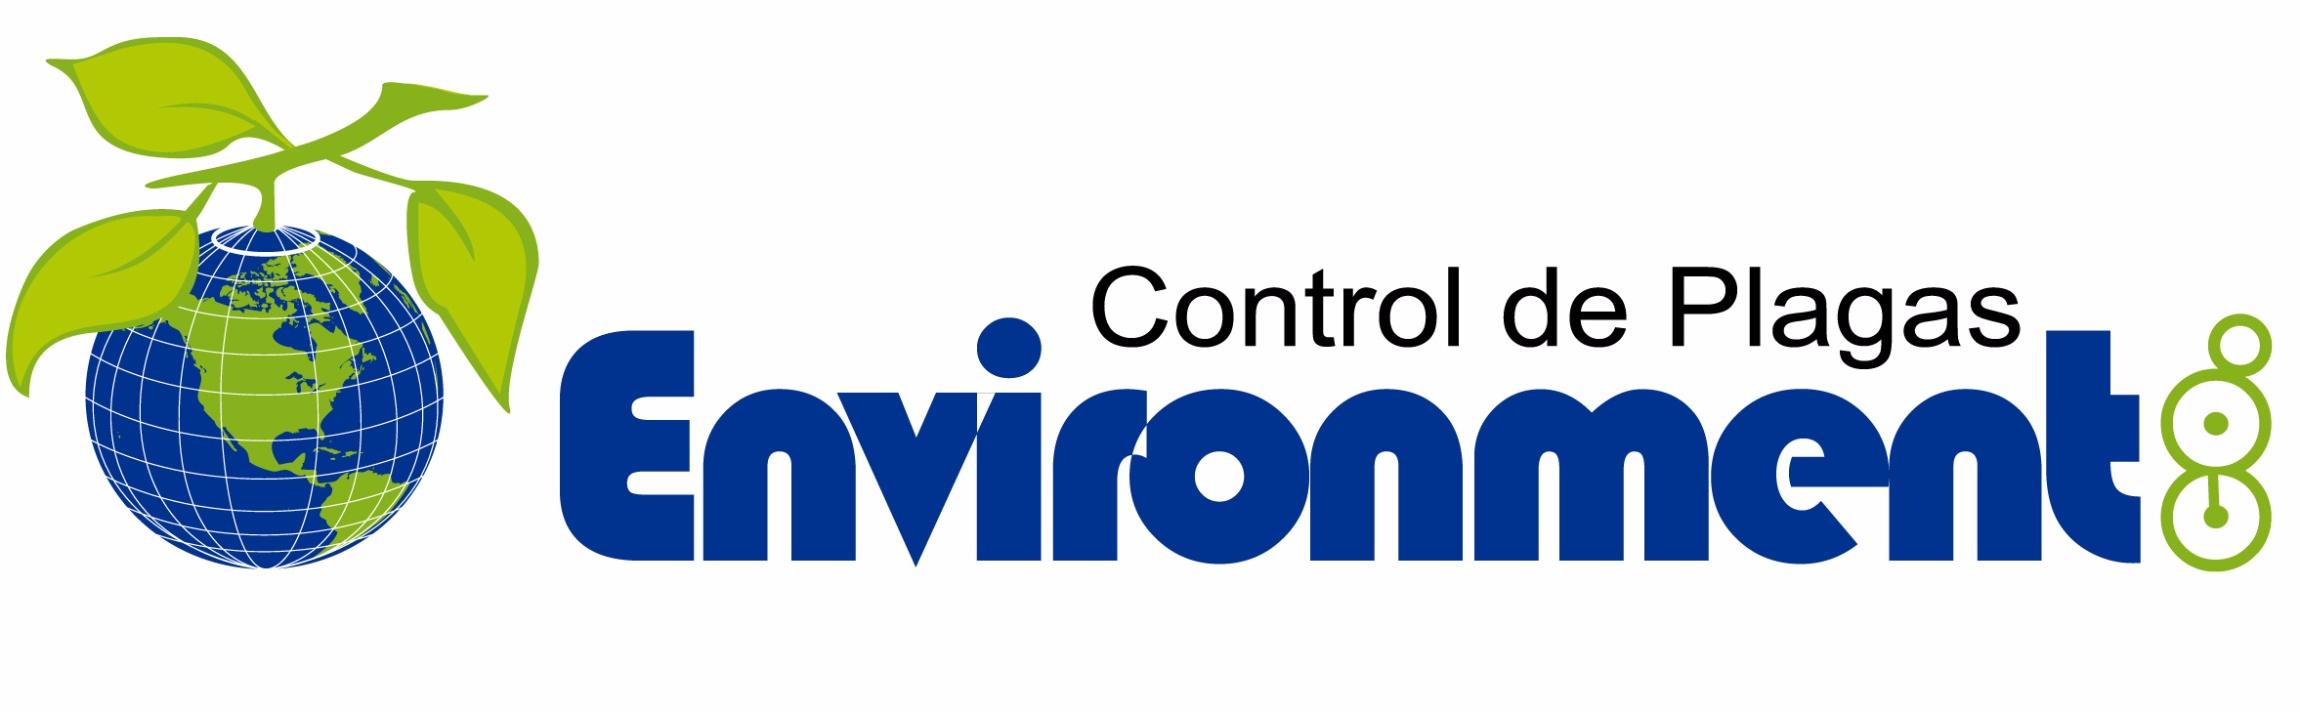 control de plagas en baja california